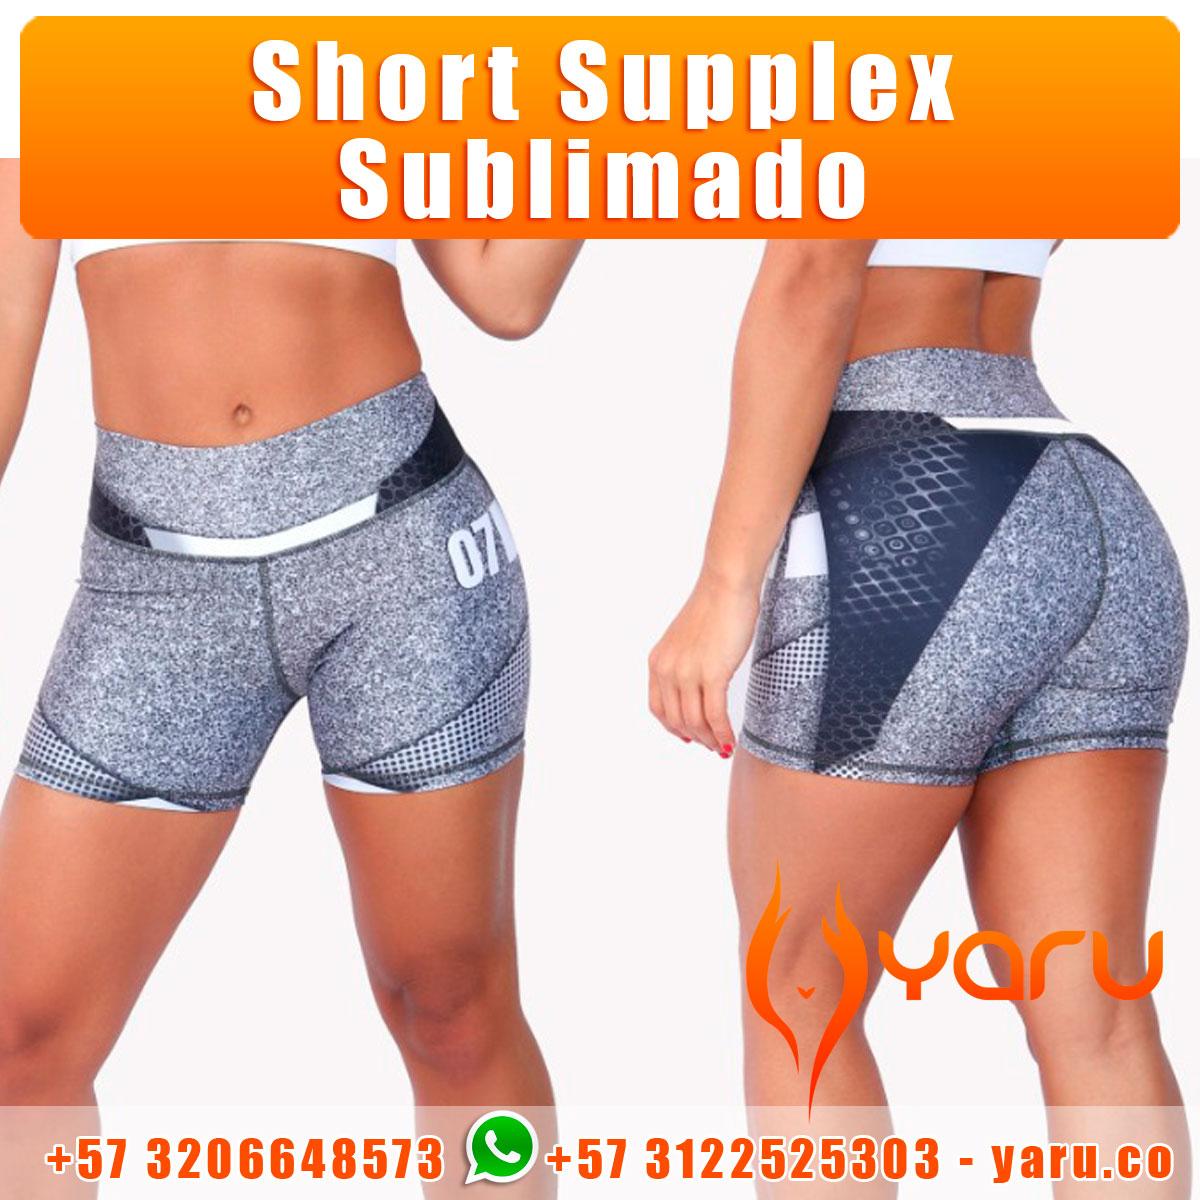 YARU Fabrica Colombiana Ropa Deportiva short supplex sublimado